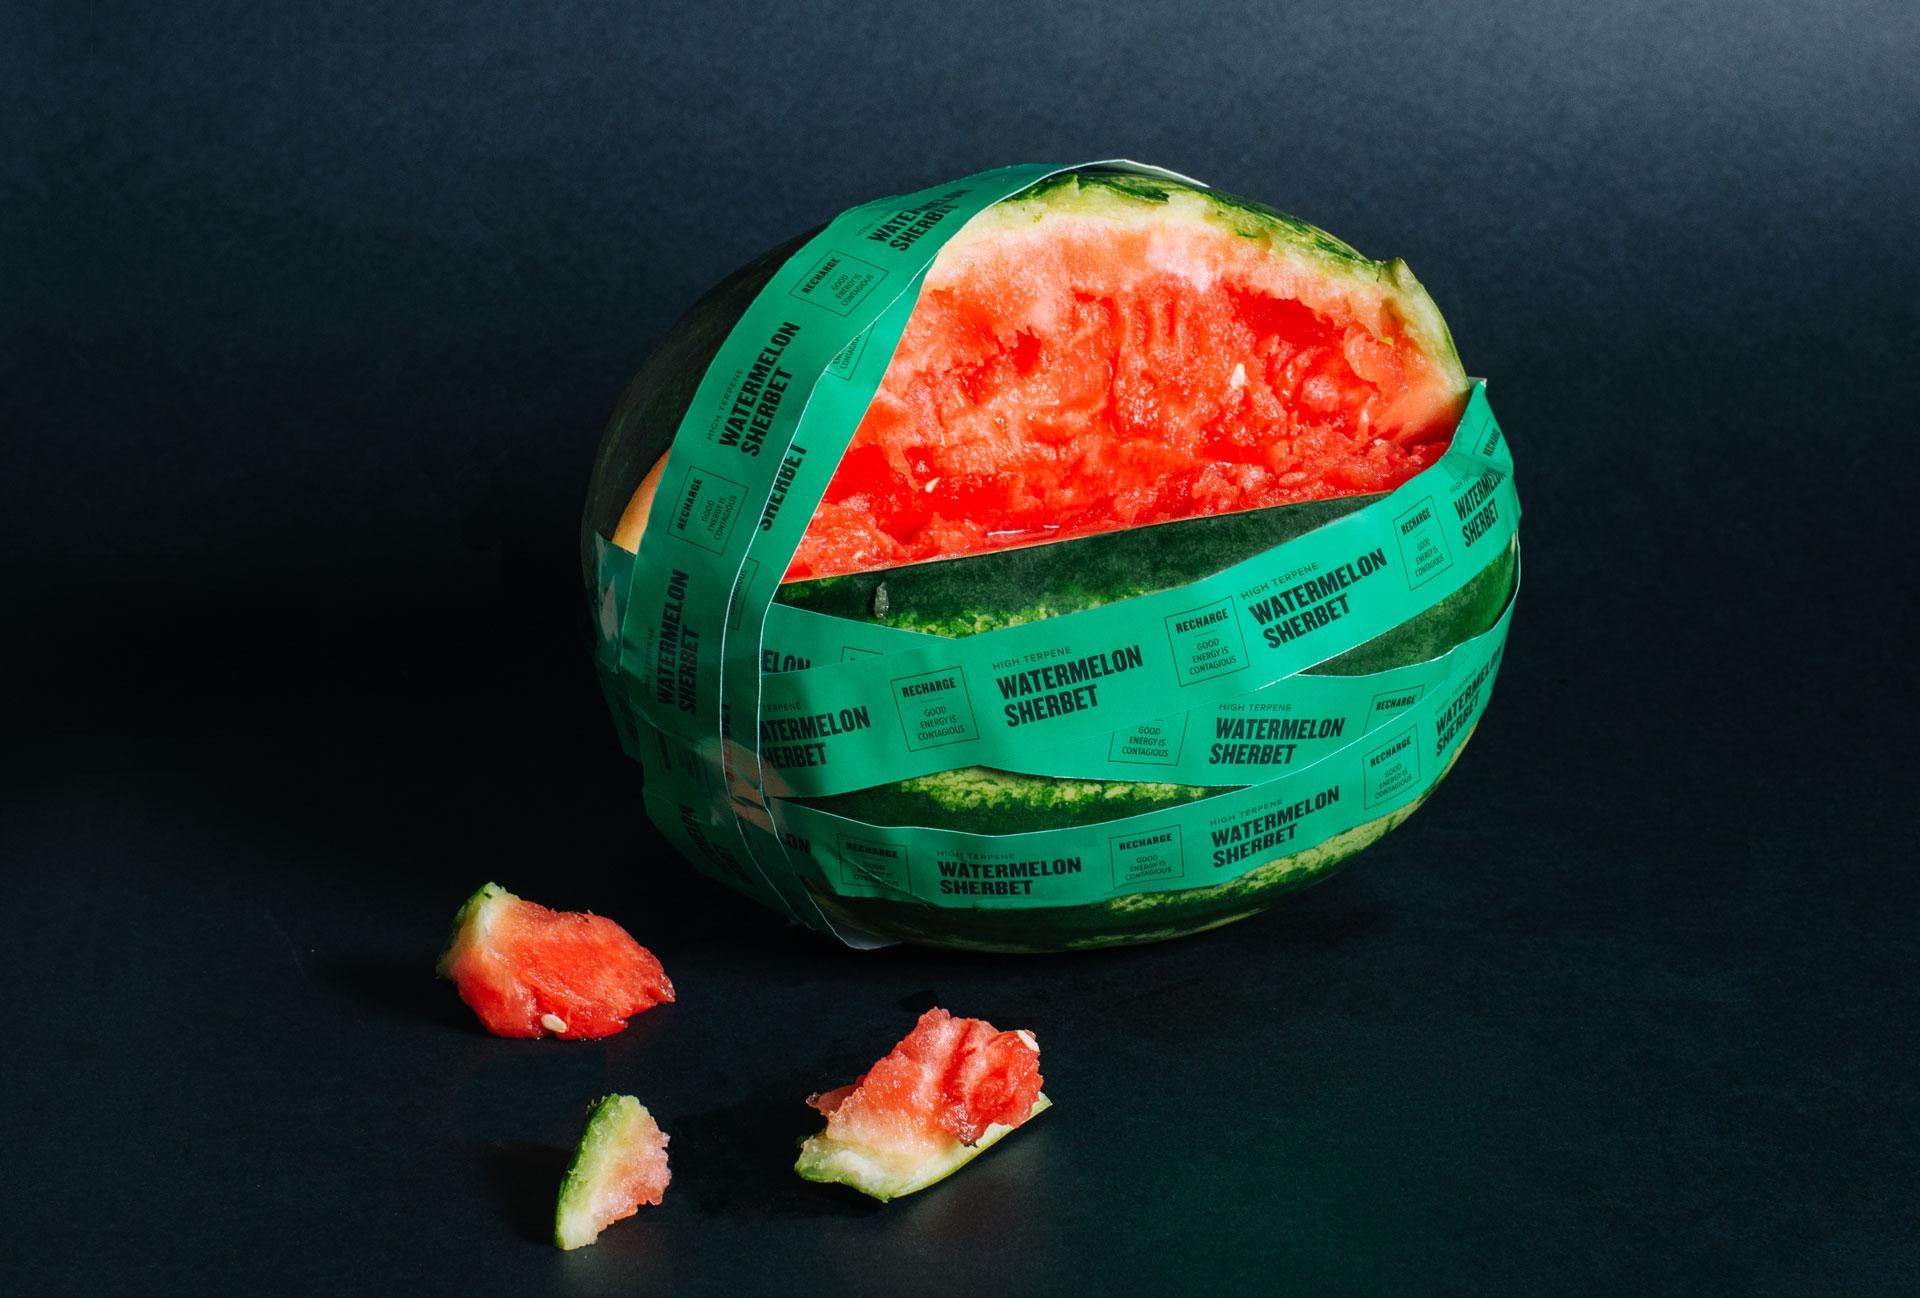 watermelon-skunk-550-1920x1298.jpg